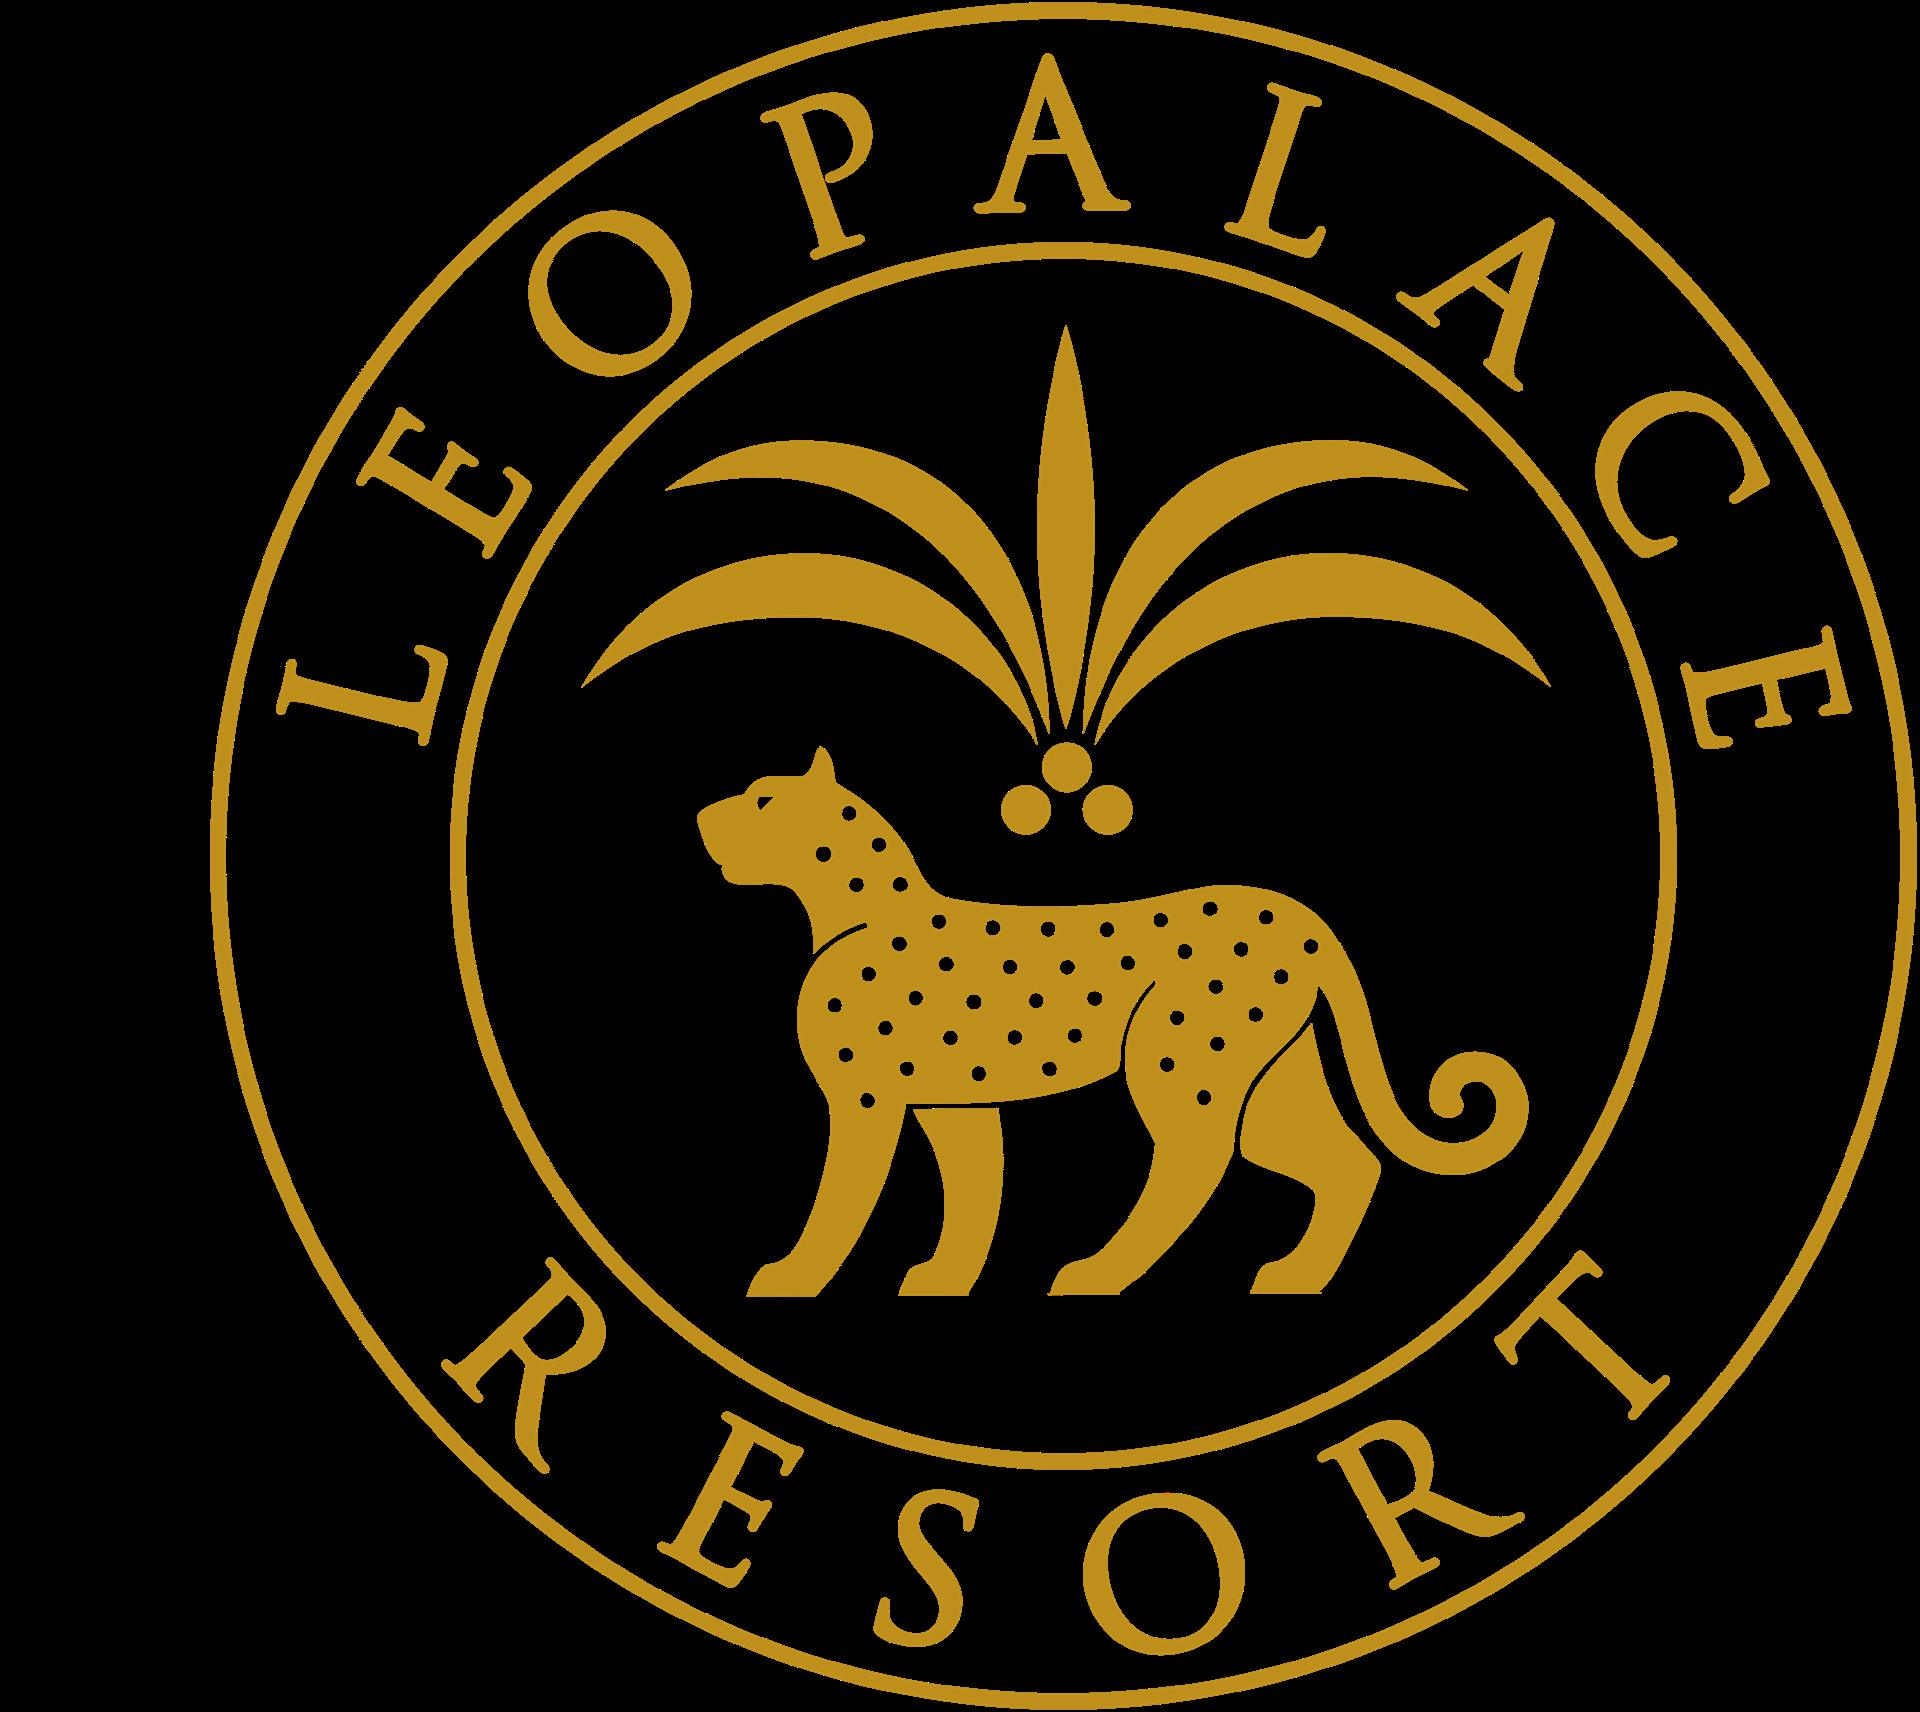 Leo_Palace_Hotels_Resorts.png